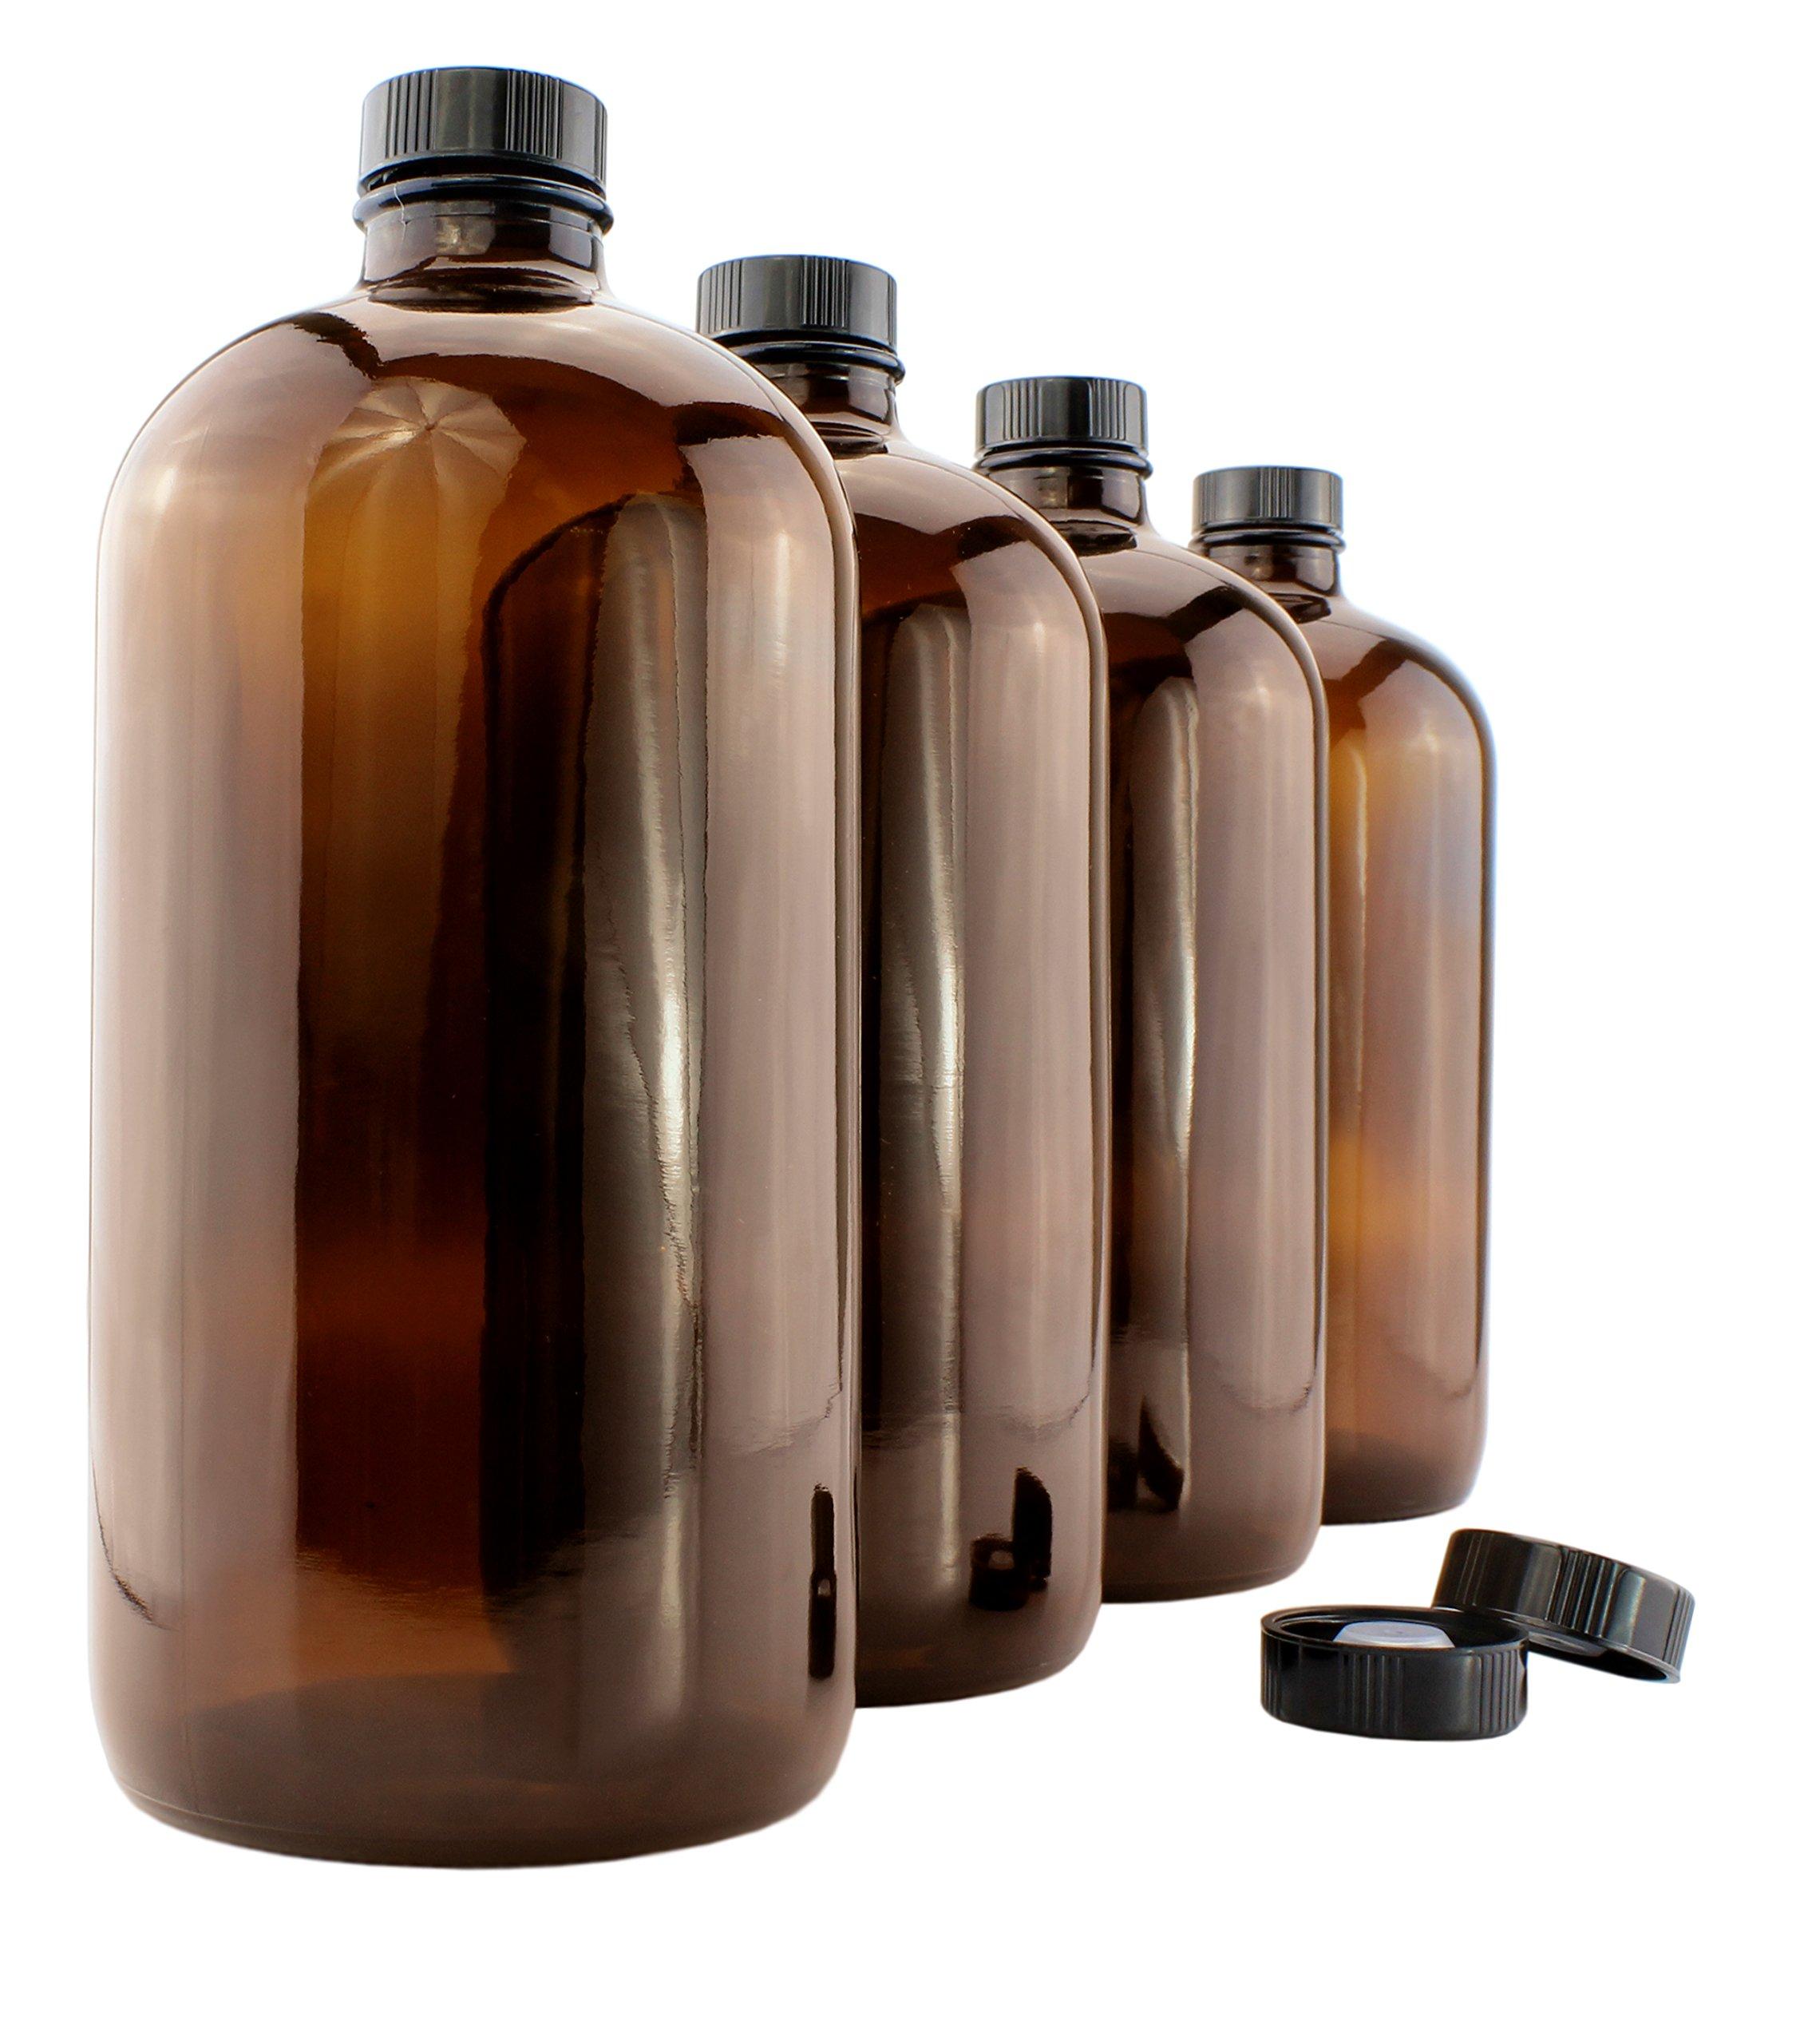 32-Ounce Amber Kombucha Growler Bottles (4-Pack); 1 Quart Boston Round Glass Bottles w/ 6 Polycone Phenolic Lids for Home Brewing by Cornucopia Brands